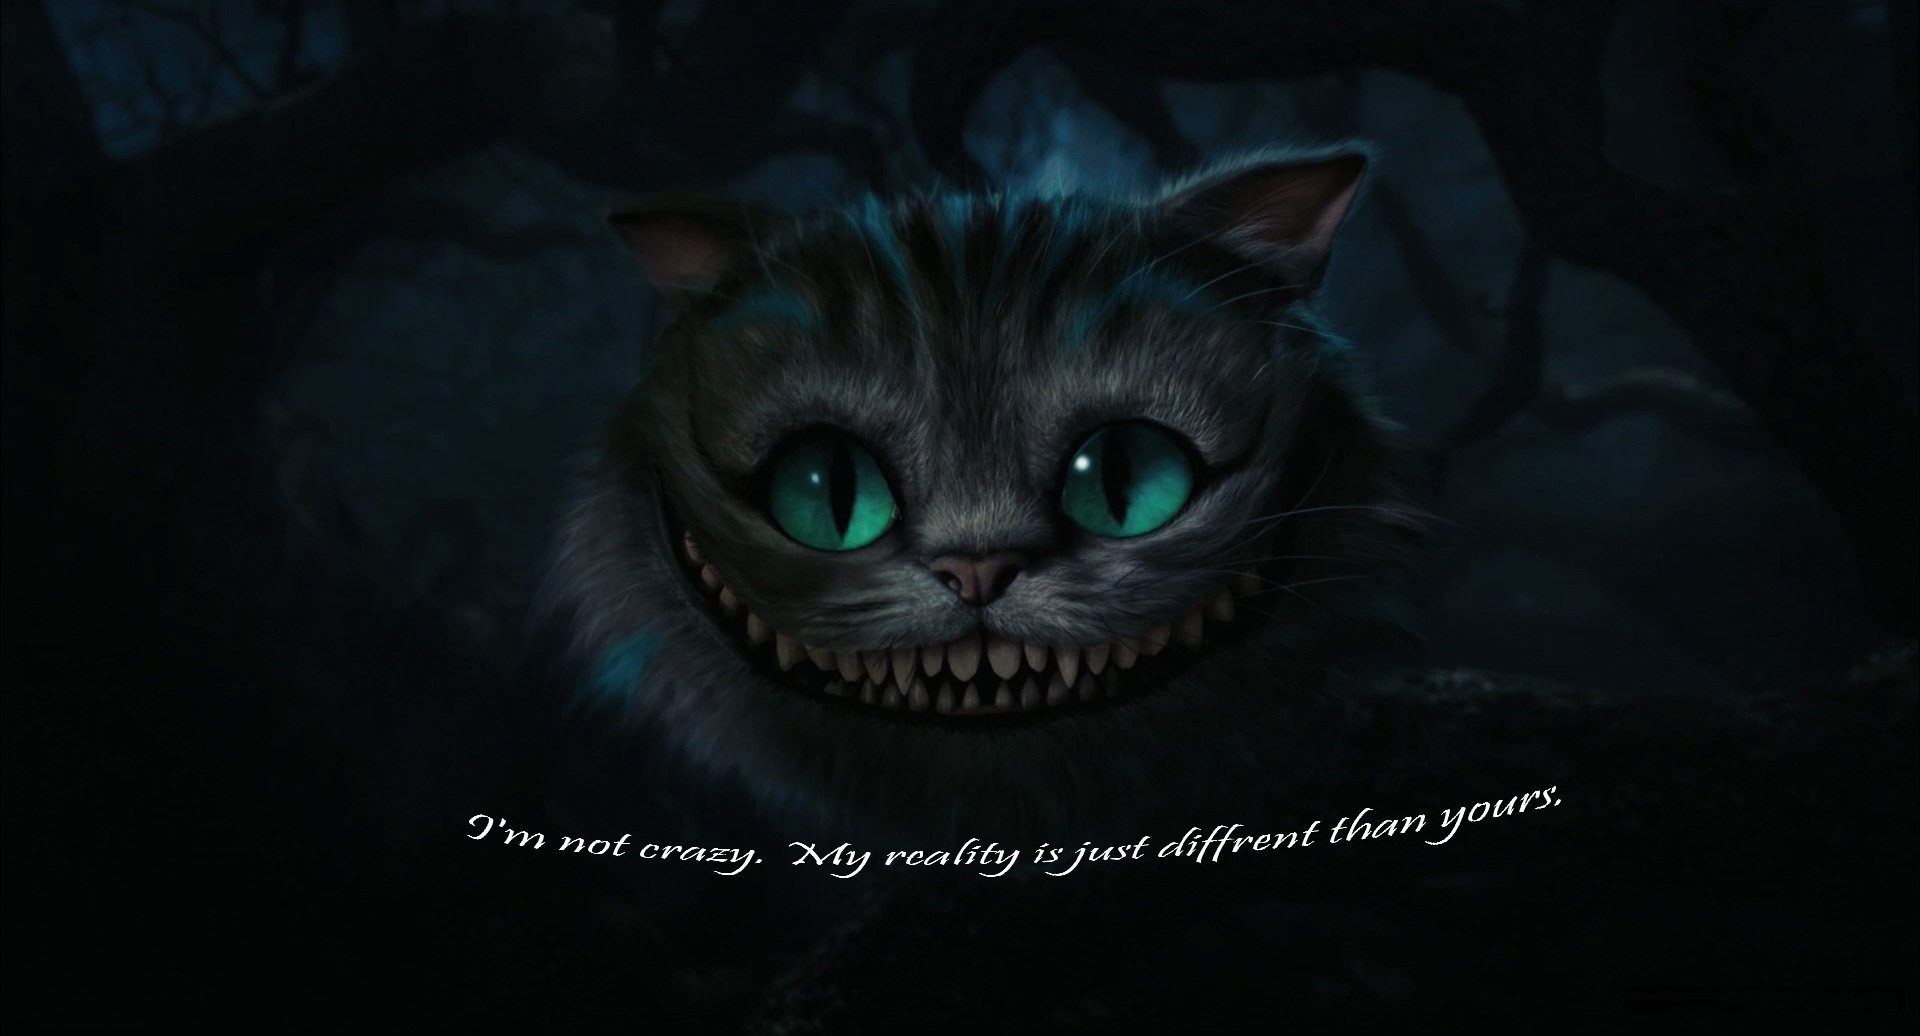 Odd Future Tron Cat Wallpaper Ofwgkta backgr…